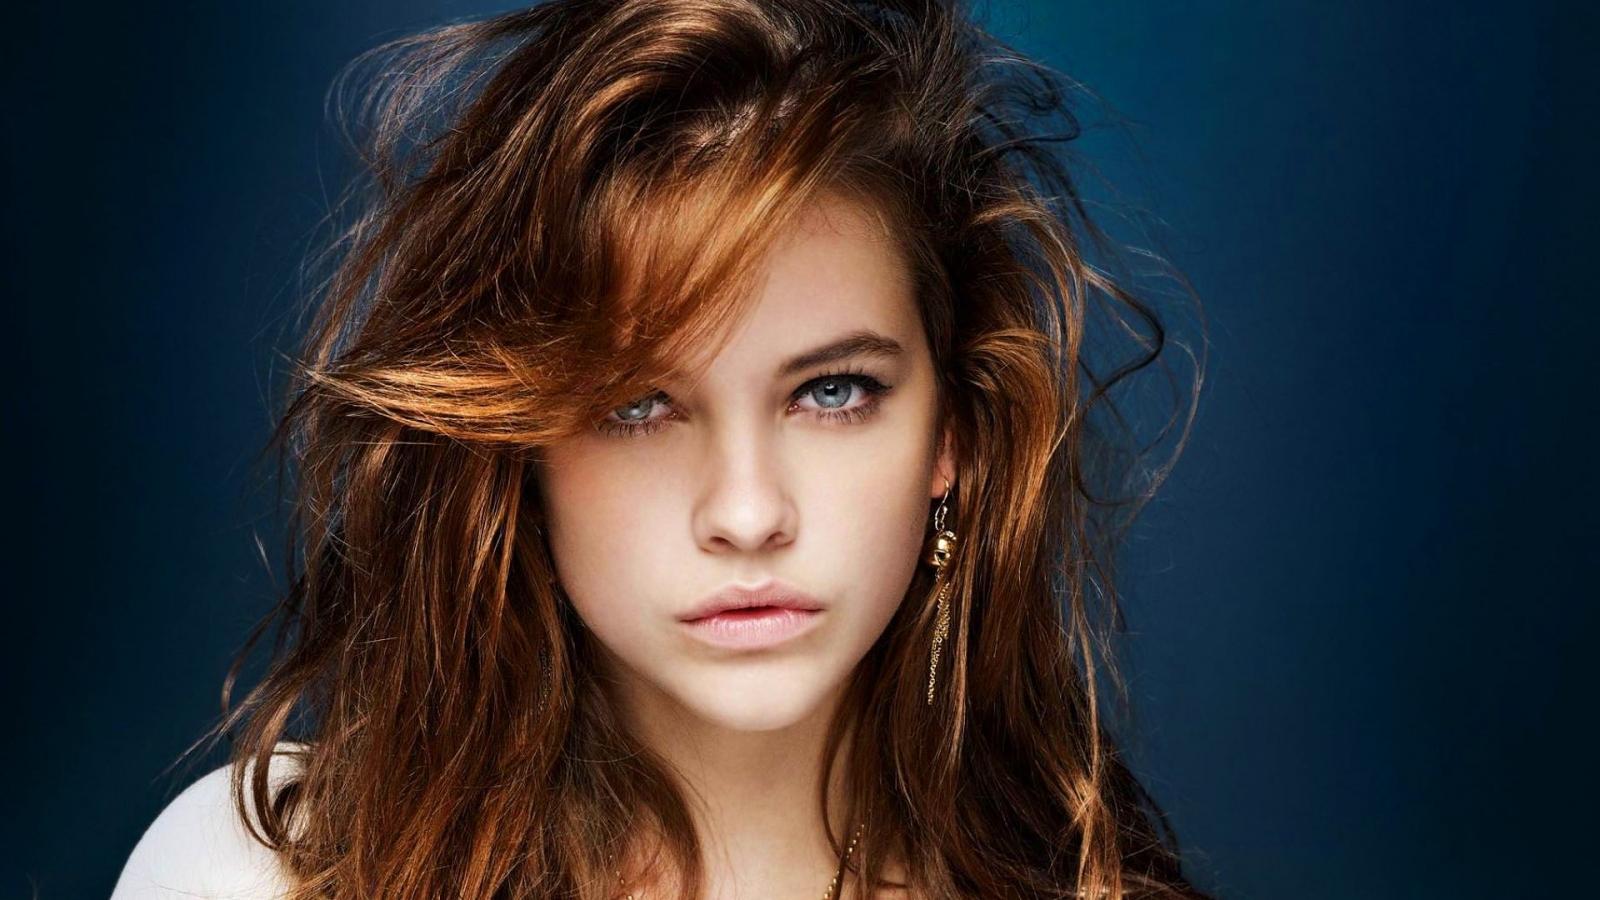 Hermosa chica despeinada - 1600x900